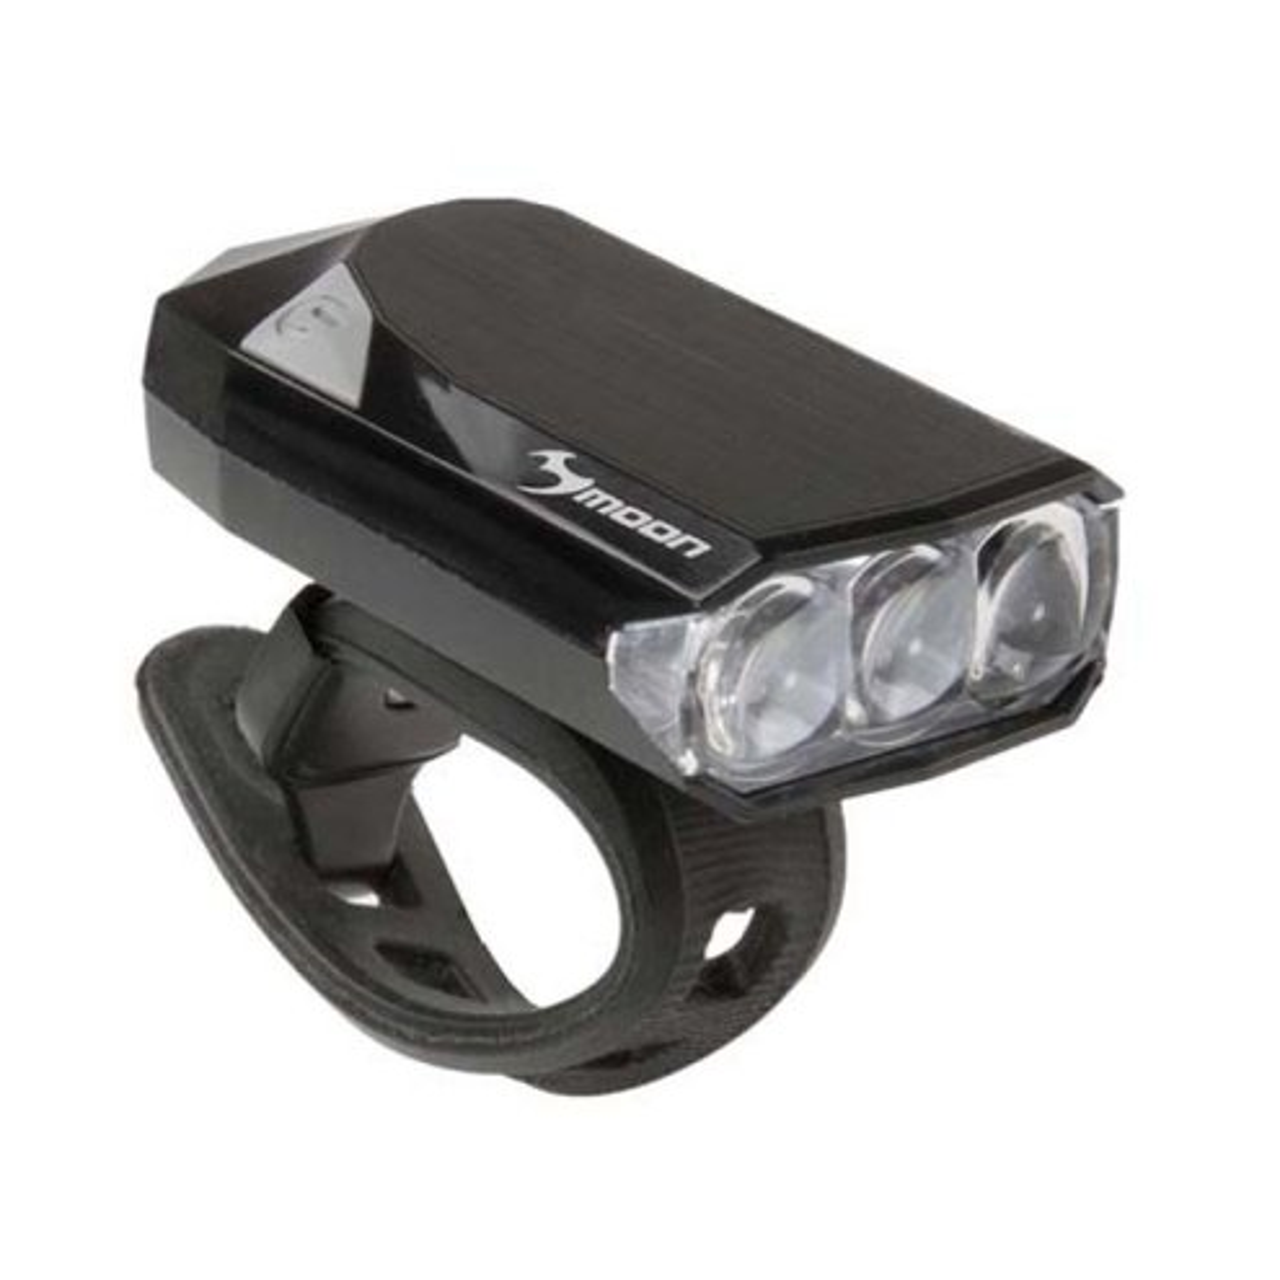 FAROL MOON 3 LEDS 16 LUMENS 3F ALUM RECAR. USB (220730)